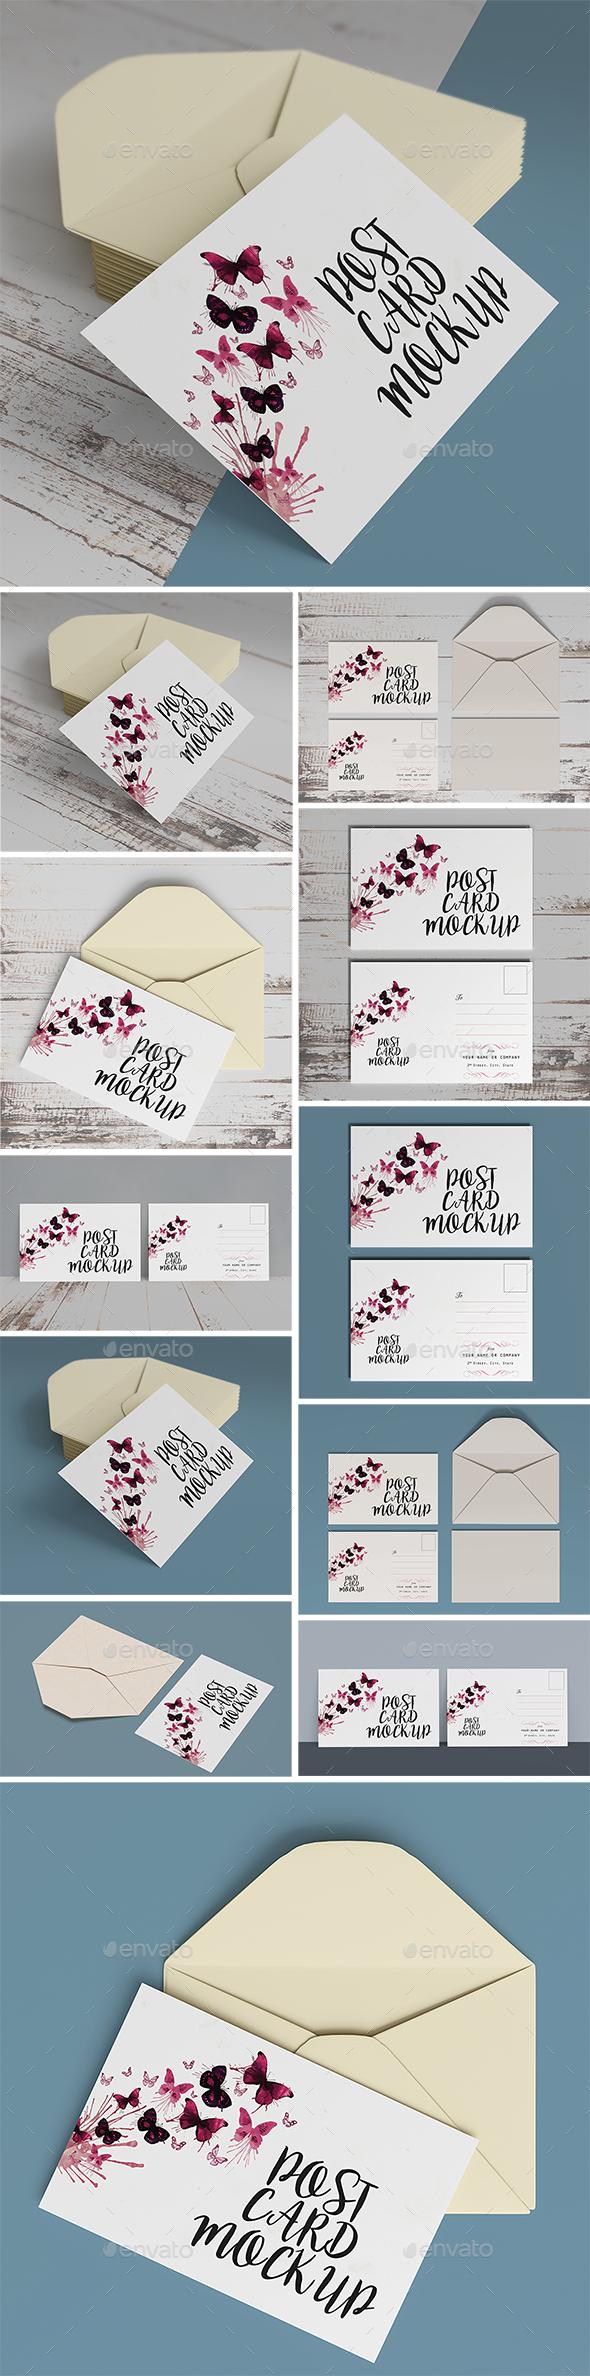 Postcard Mockups - Miscellaneous Print